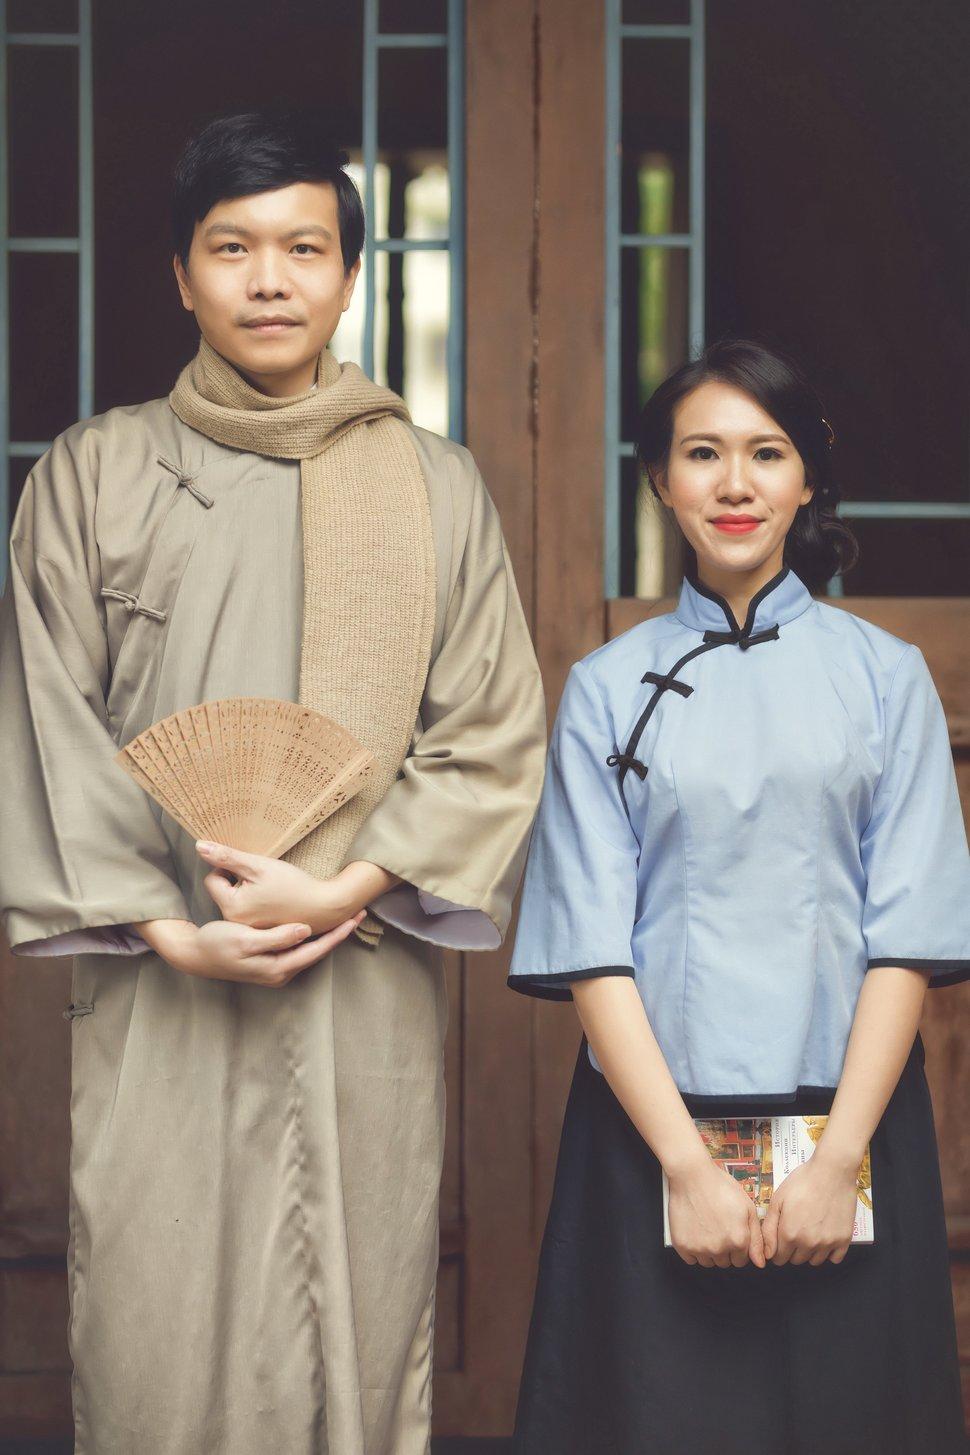 Khalil Chou(經典復古)-9 - 凱勒・周 獨立影像《結婚吧》